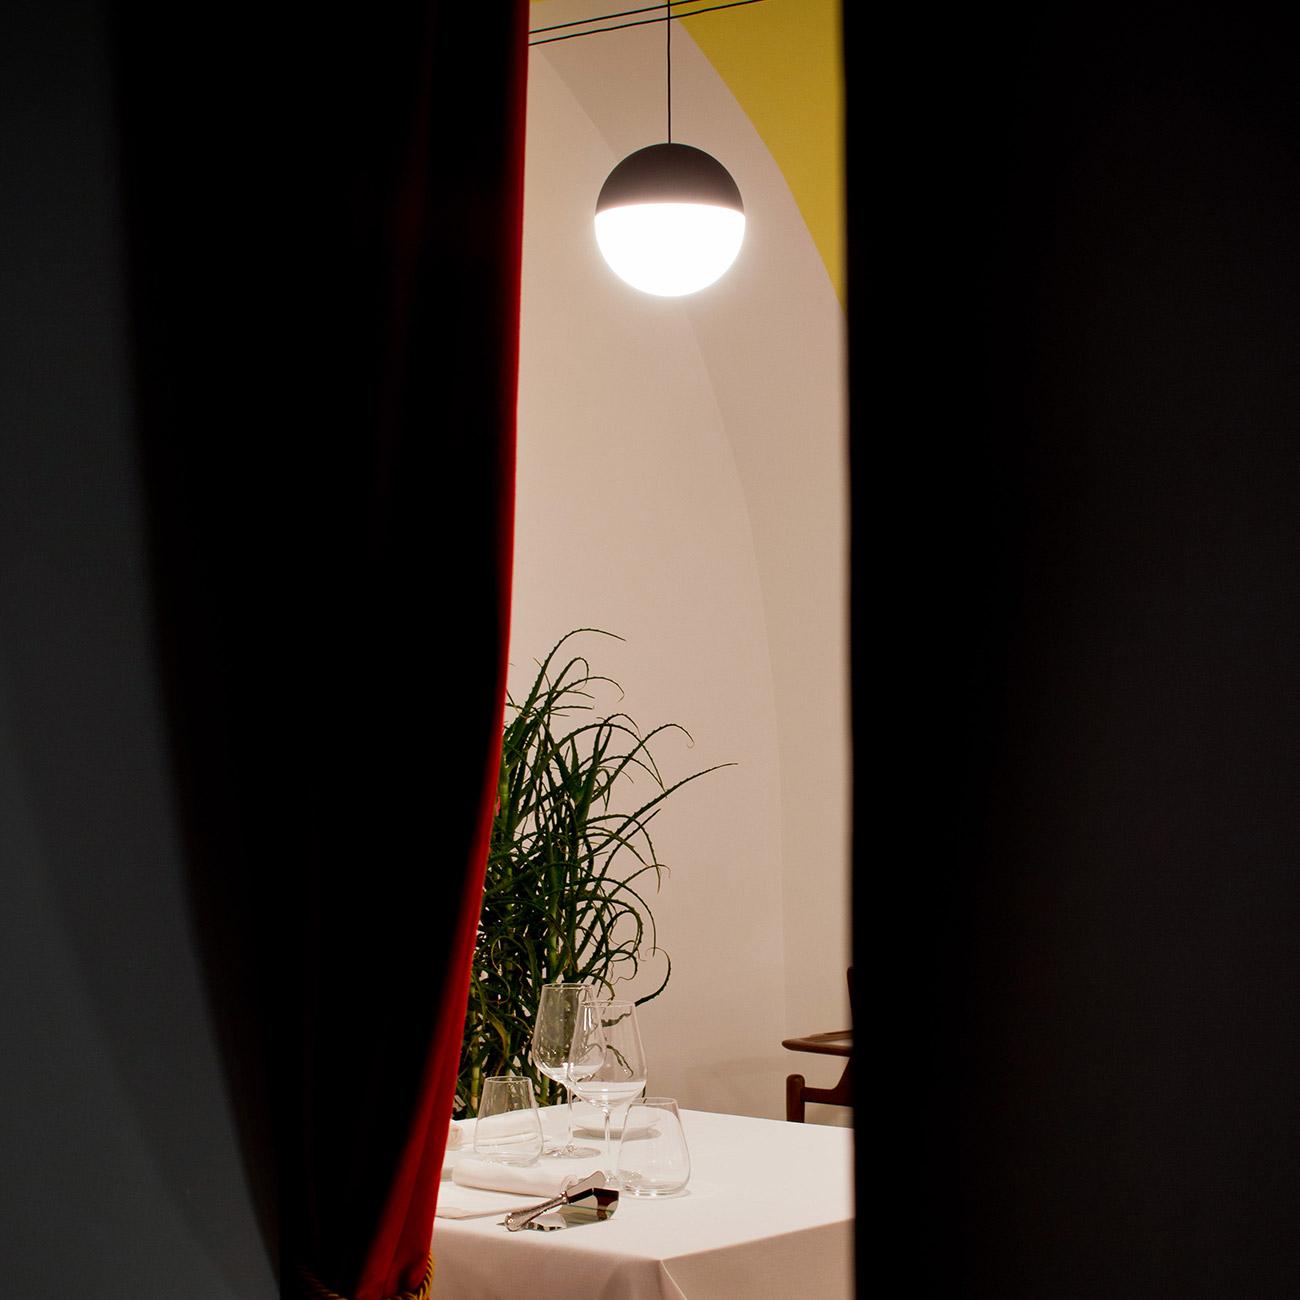 Laboratorio - Dina ristorante